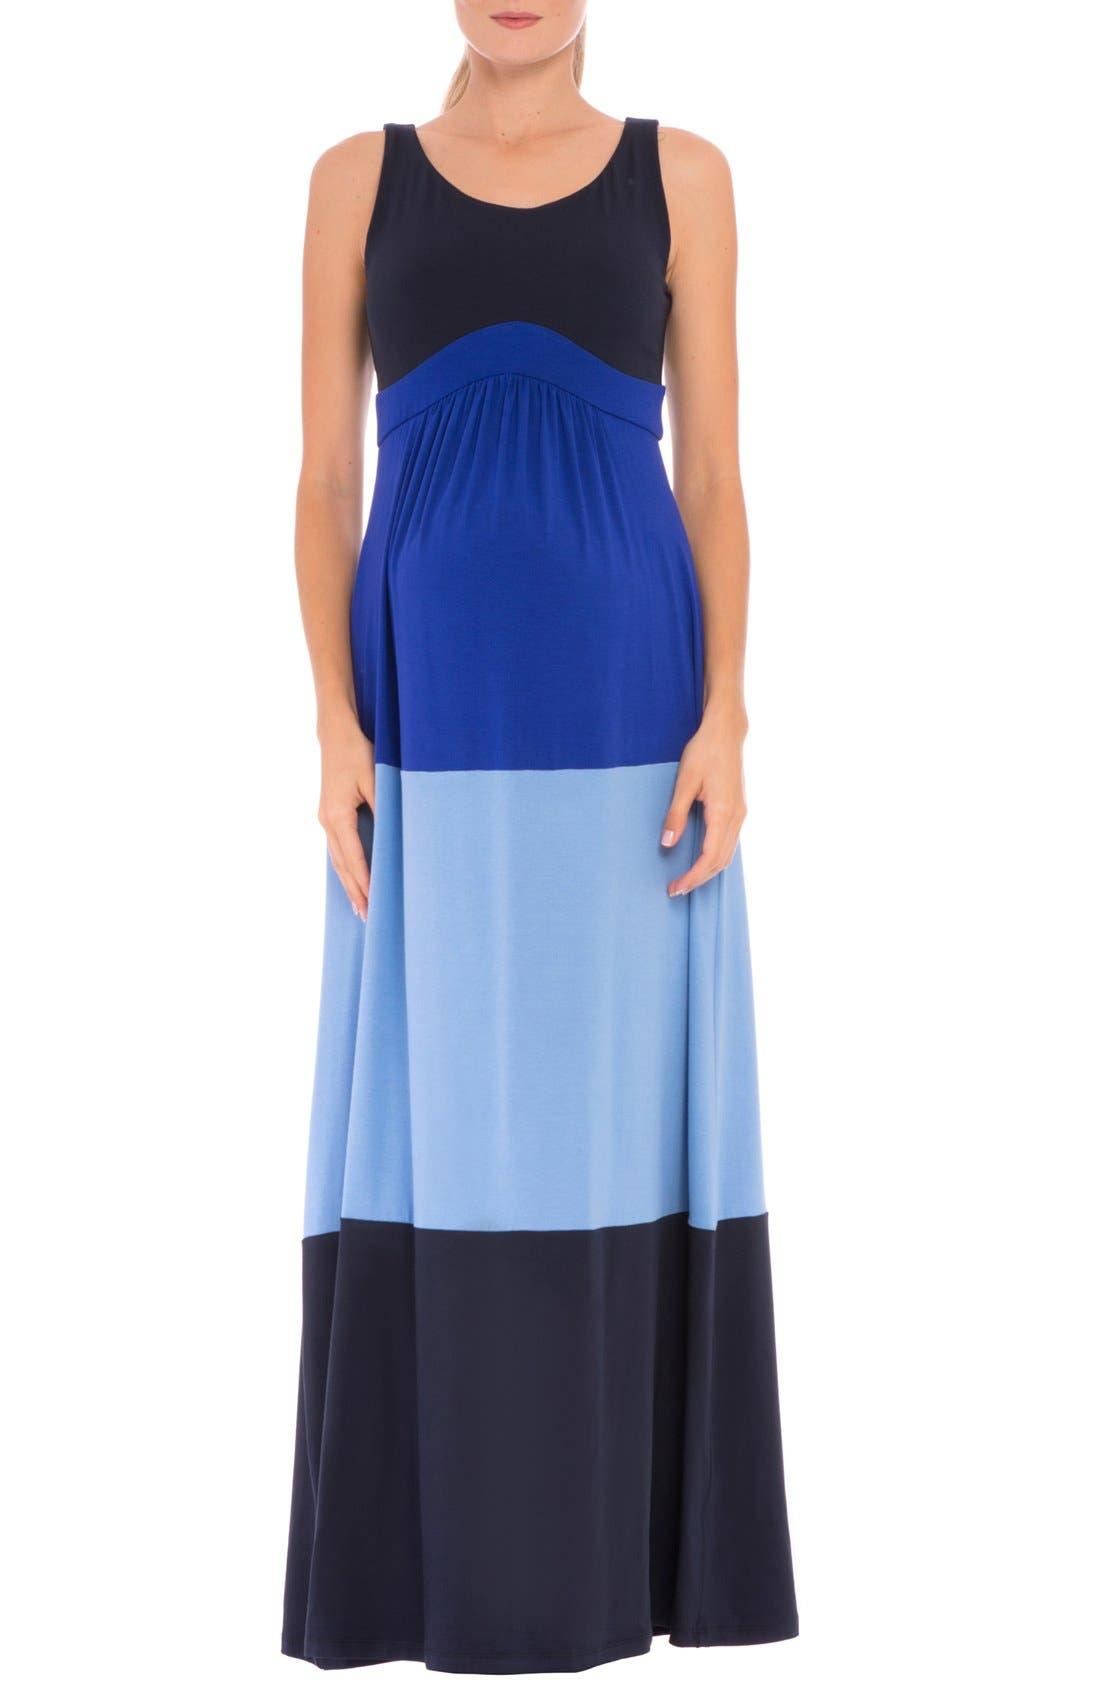 'Margarette' Colorblock Maternity Tank Dress,                         Main,                         color, Navy